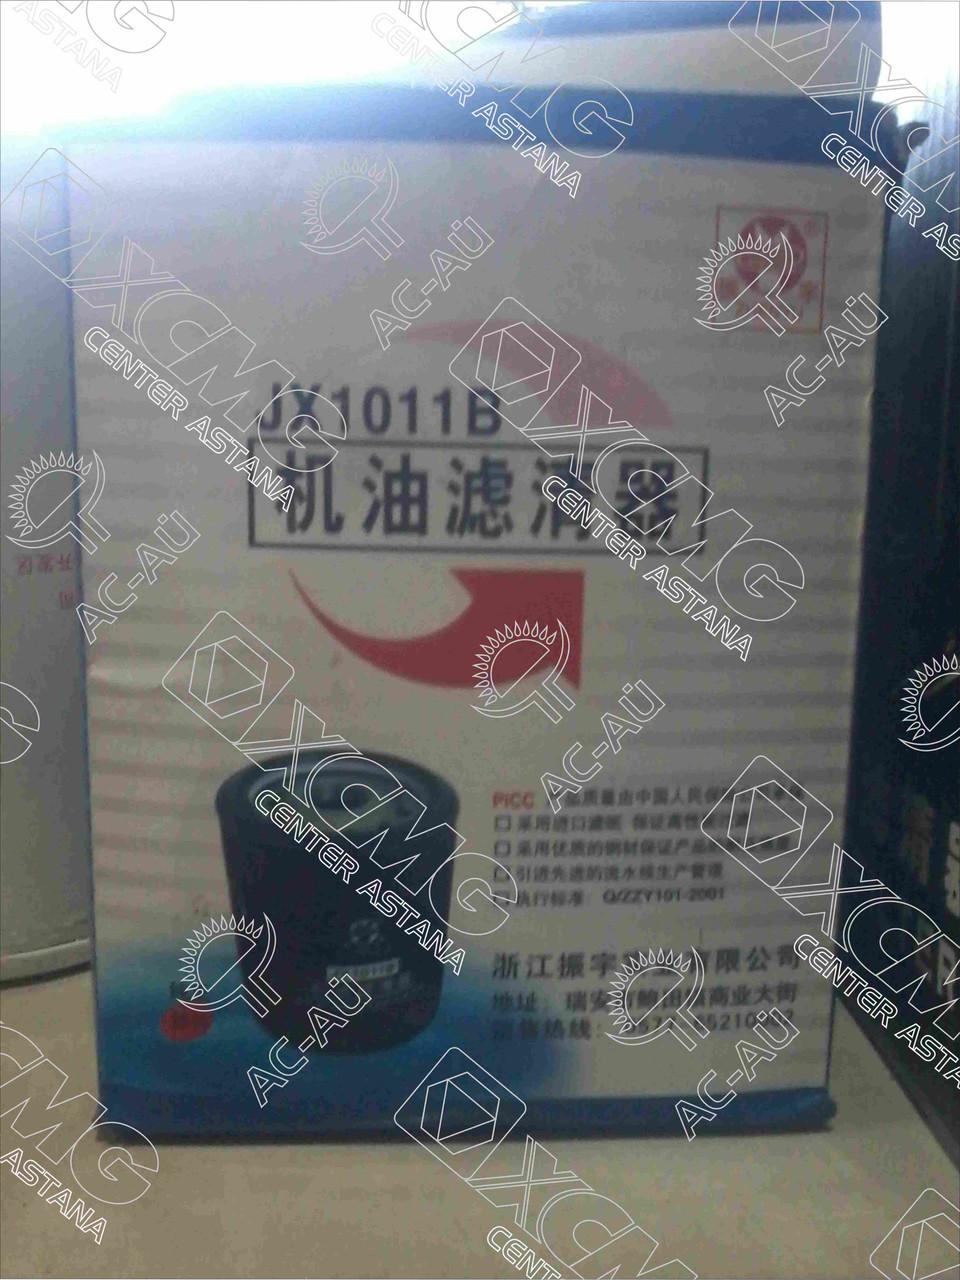 Масляный фильтр JX1011B ZL30G